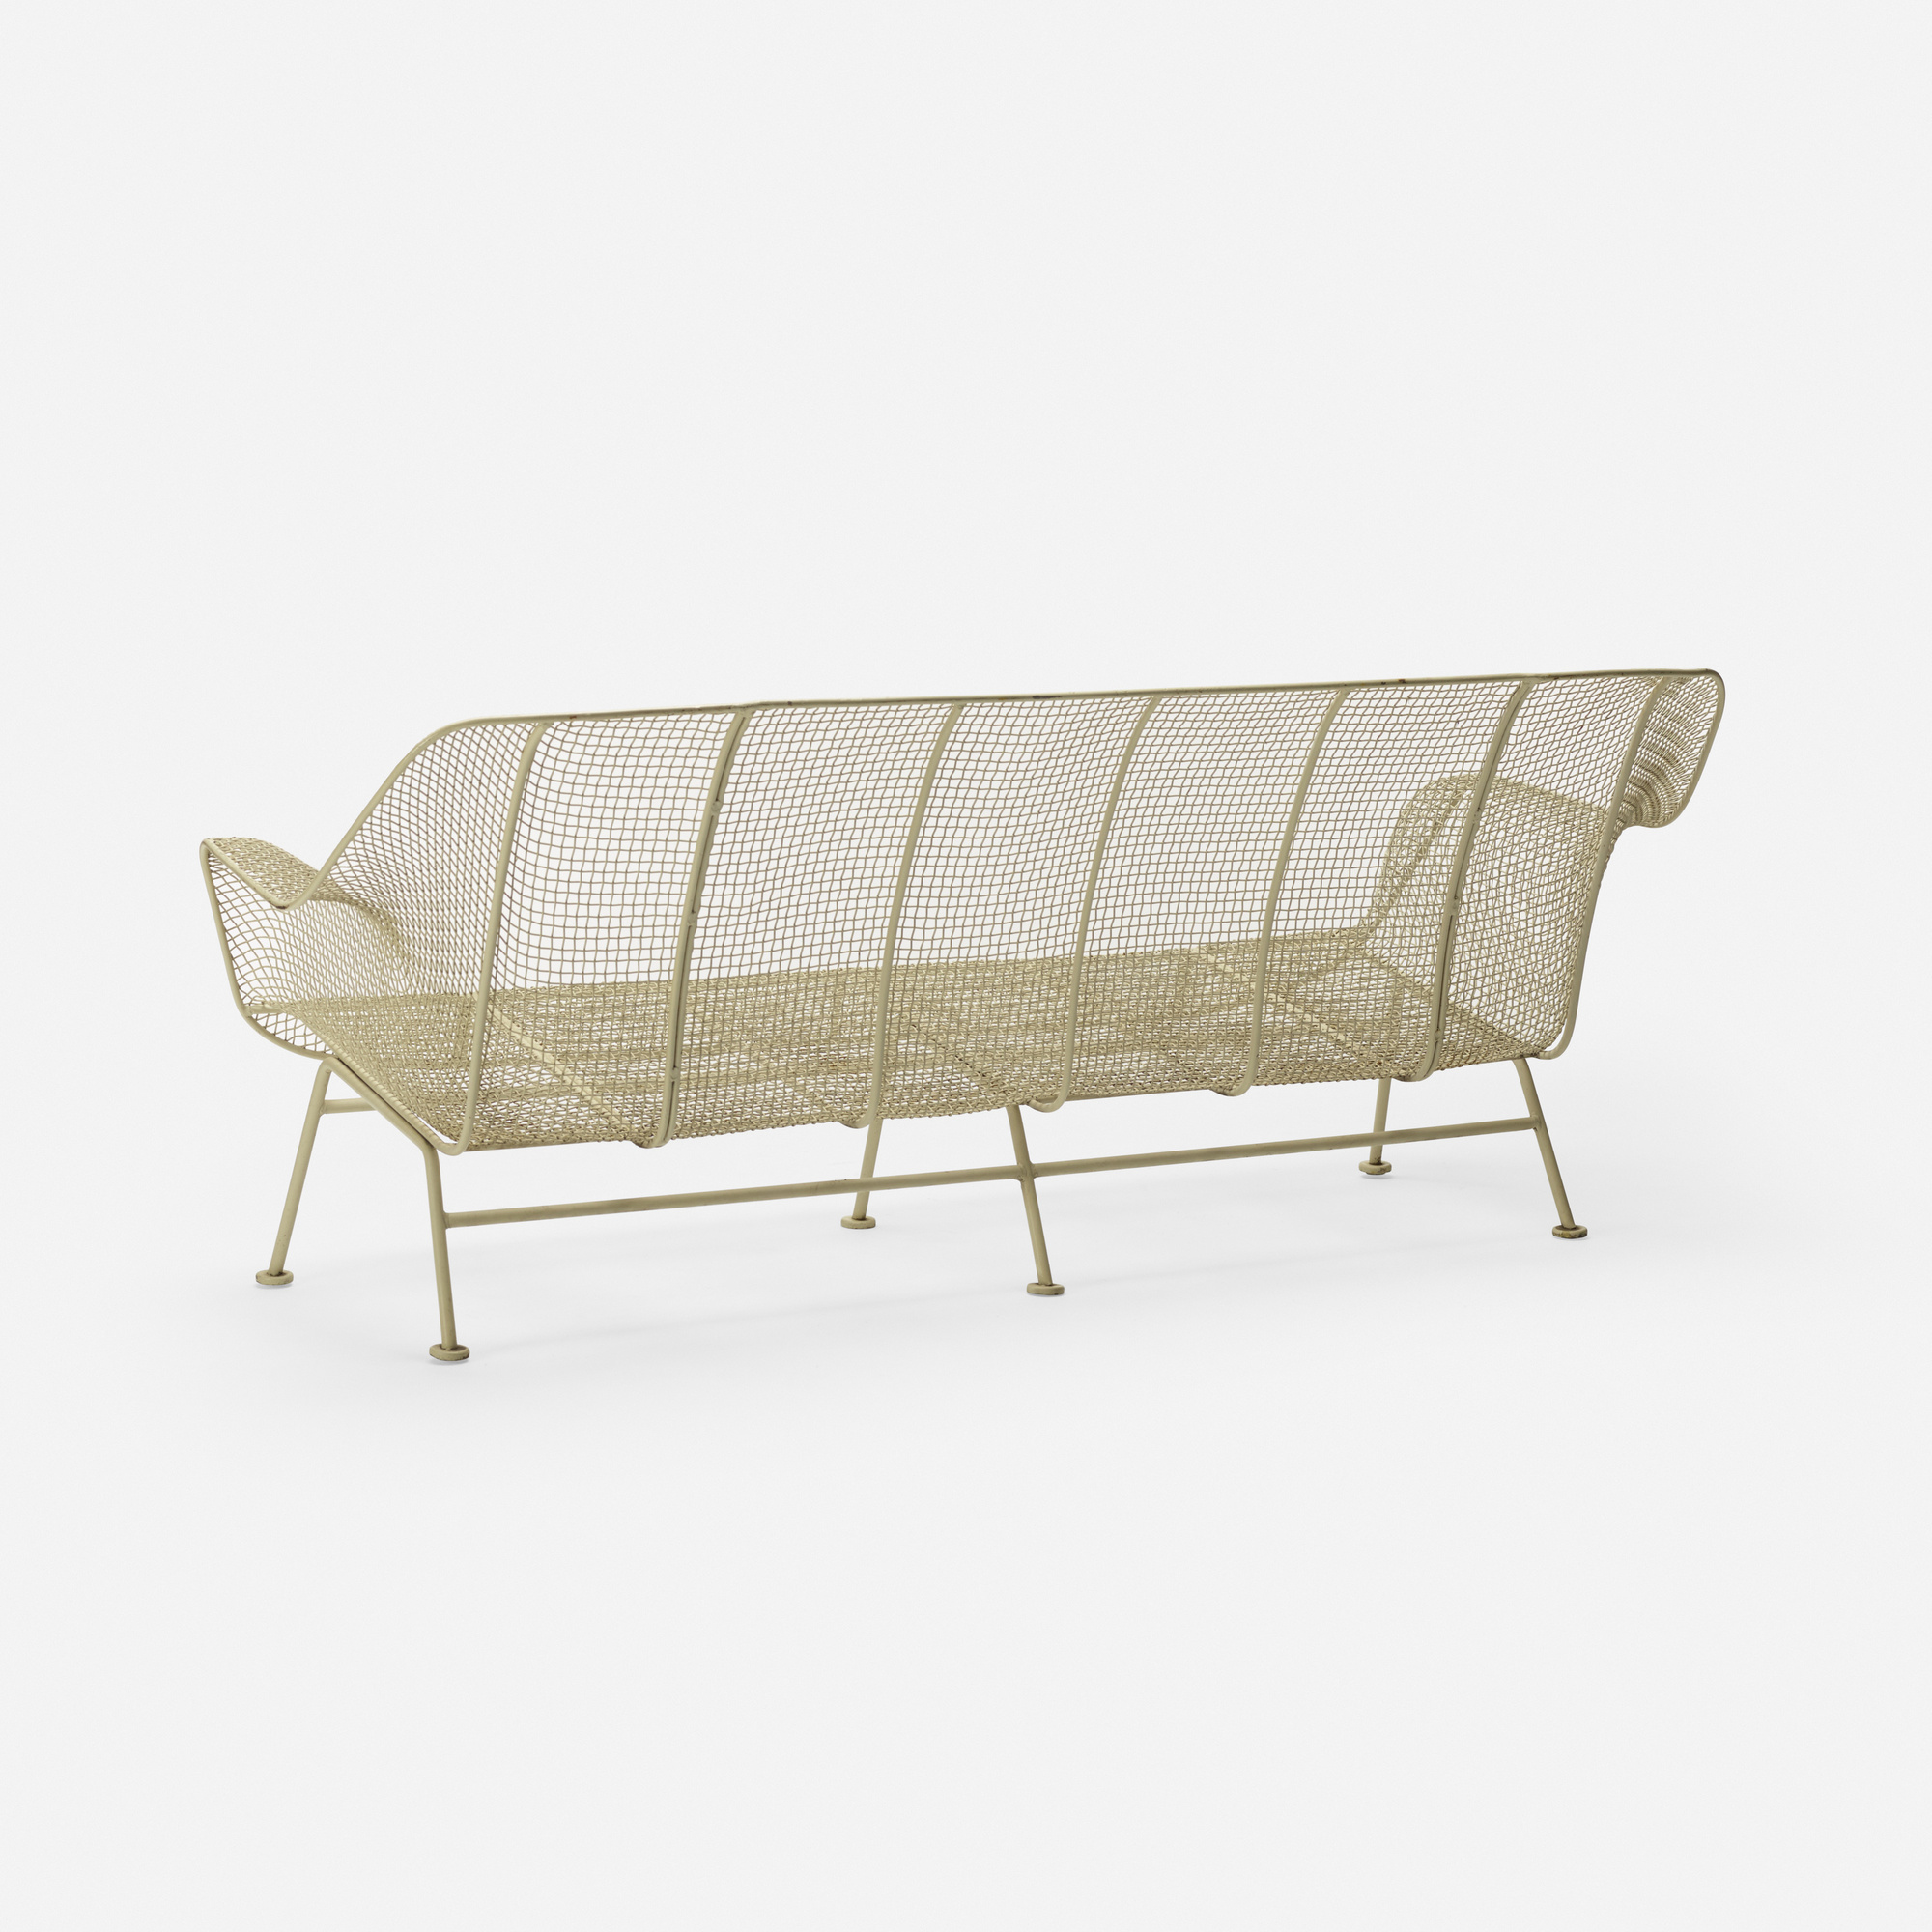 354: Russell Woodard / Sculptura sofa (2 of 3)